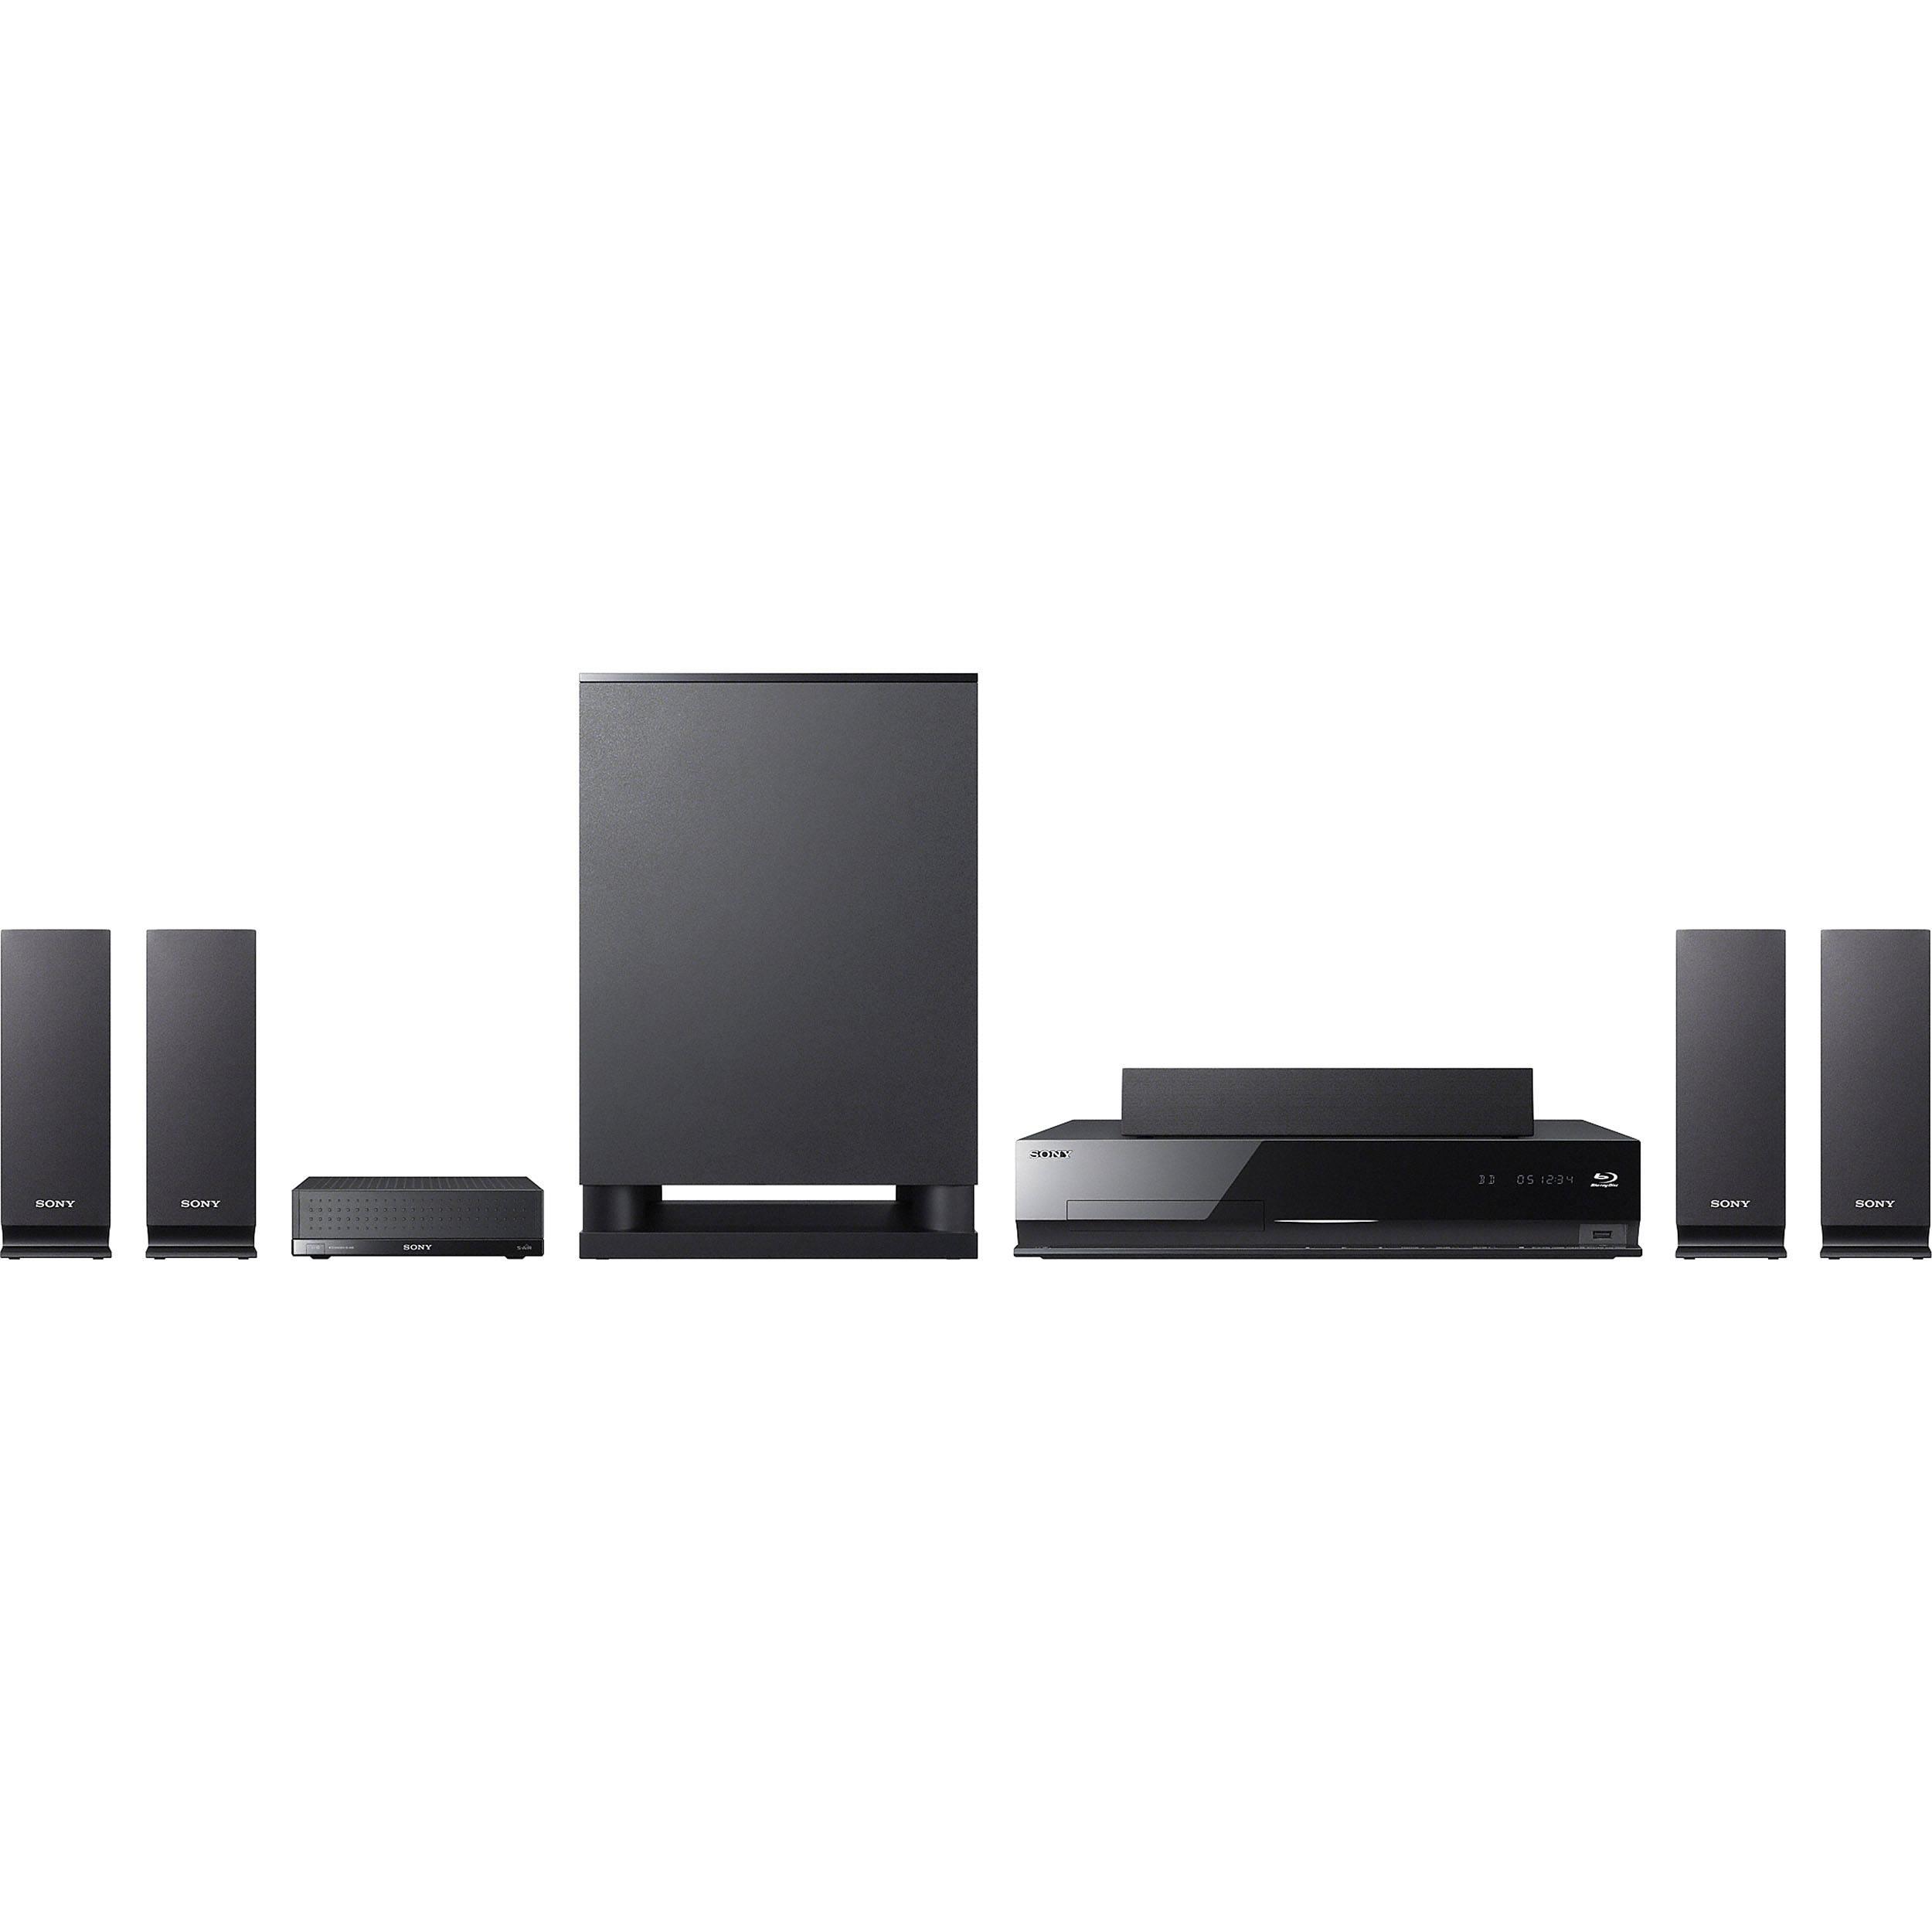 sony bdv e770w blu ray home theater system bdv e770w b h photo. Black Bedroom Furniture Sets. Home Design Ideas